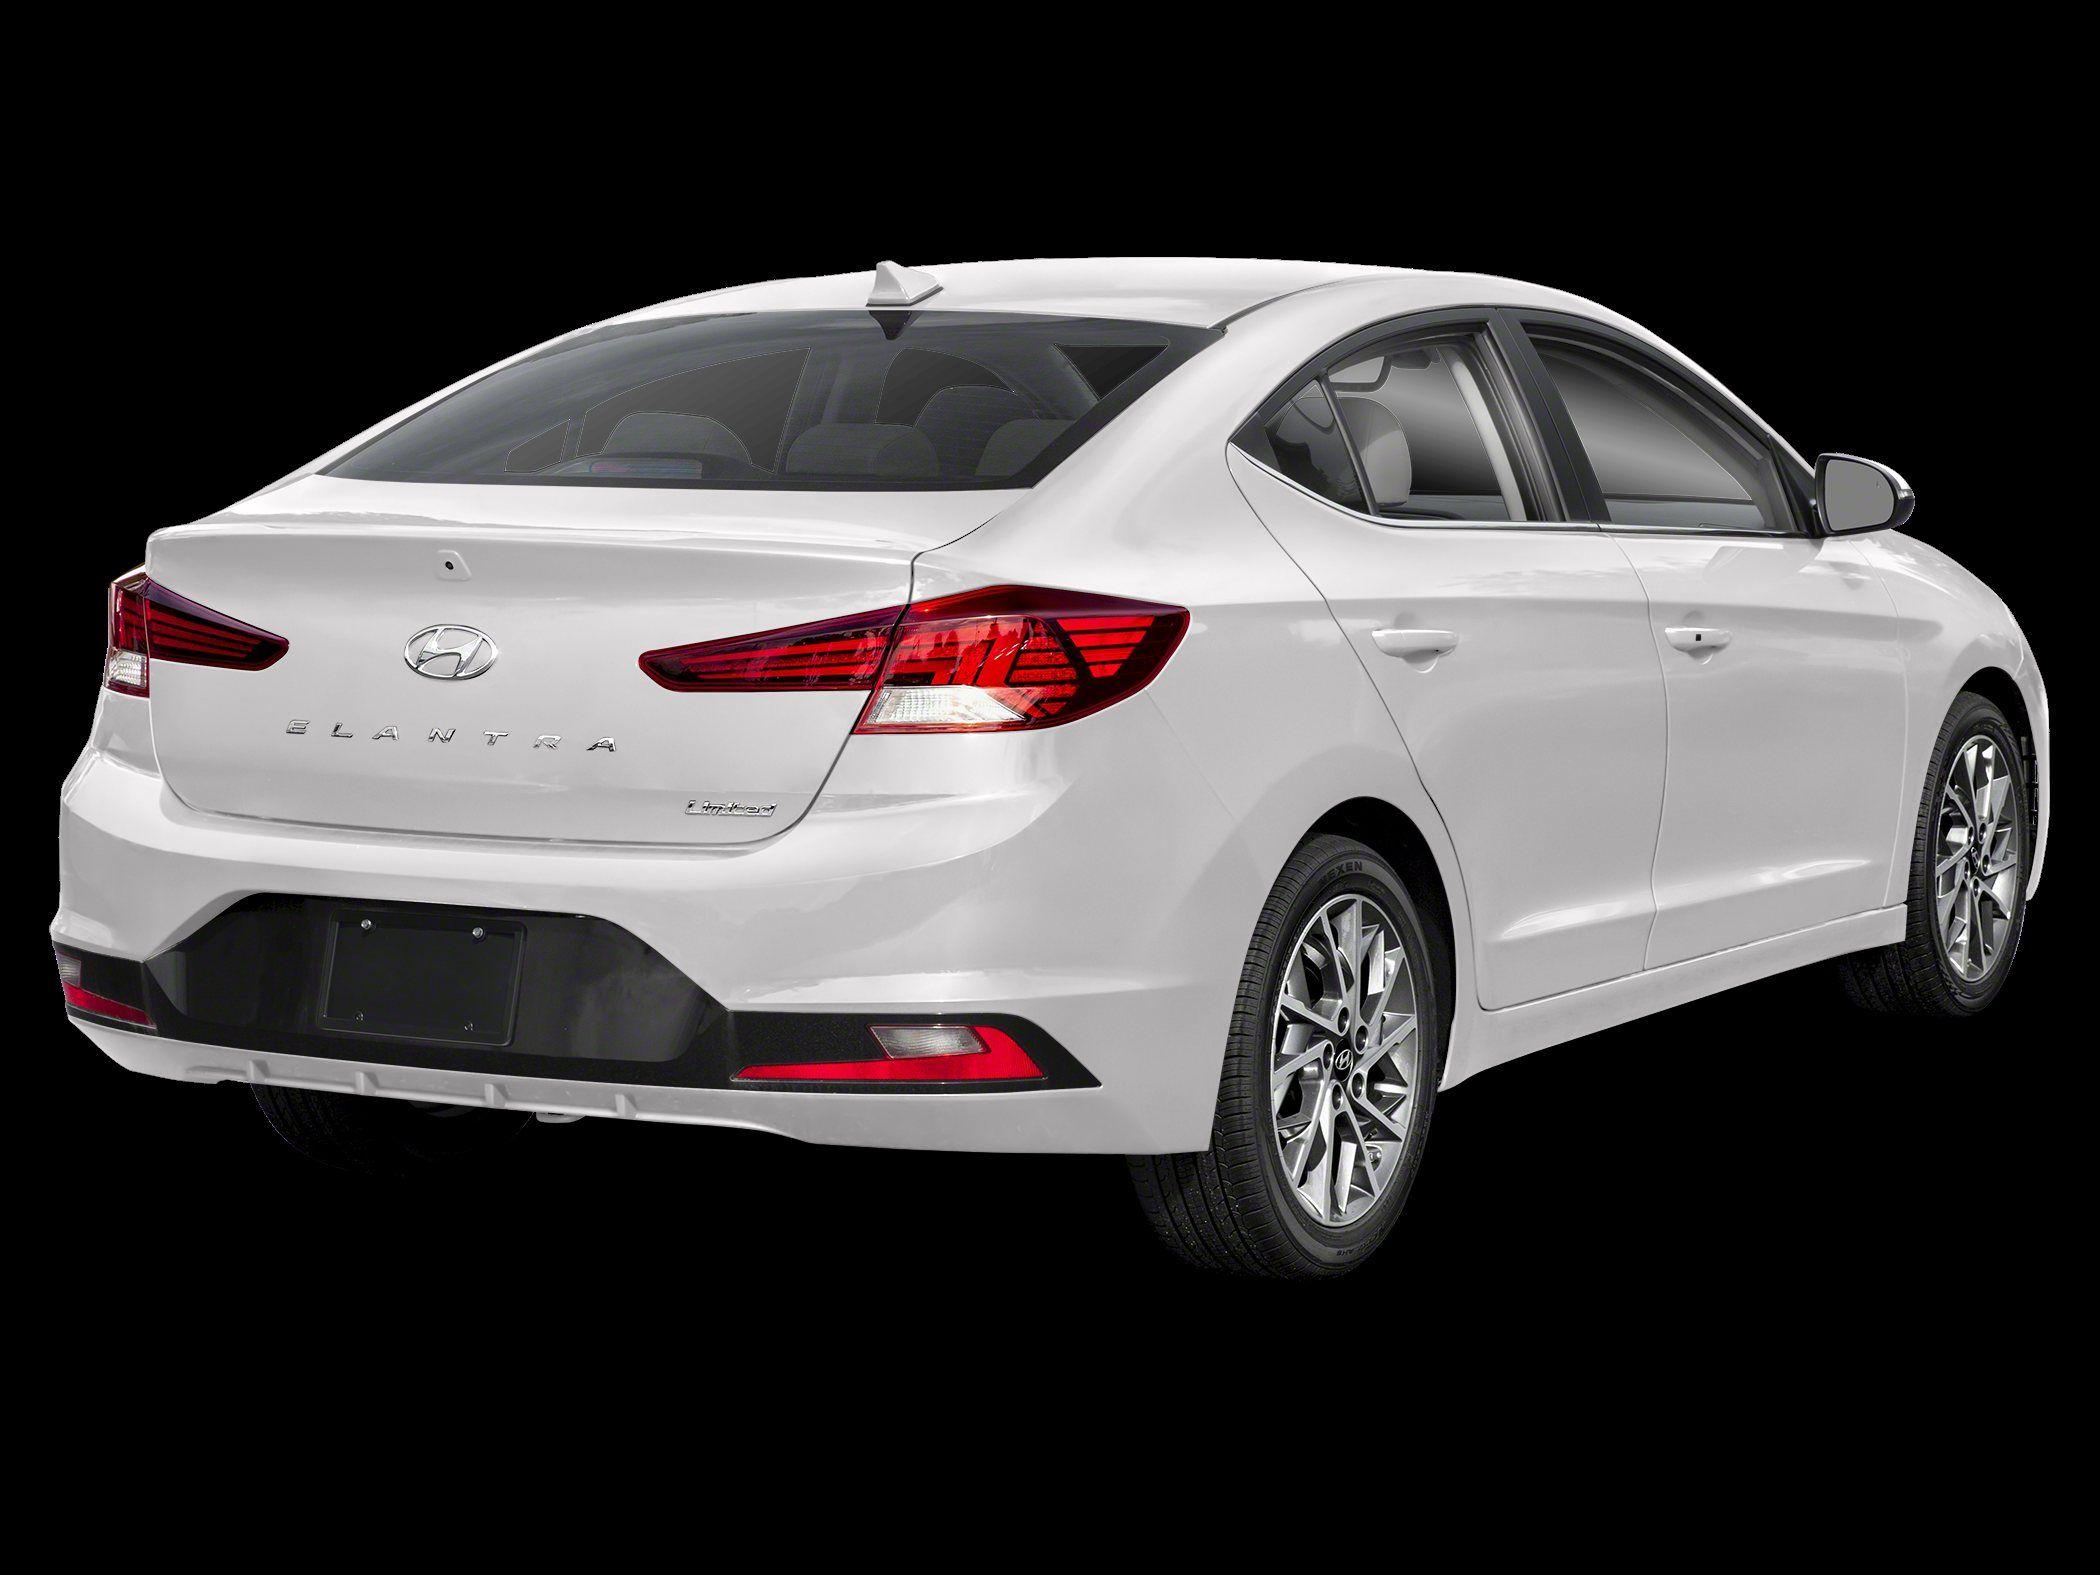 2020 Hyundai Elantra New Review In 2020 Elantra Hyundai Elantra Hyundai